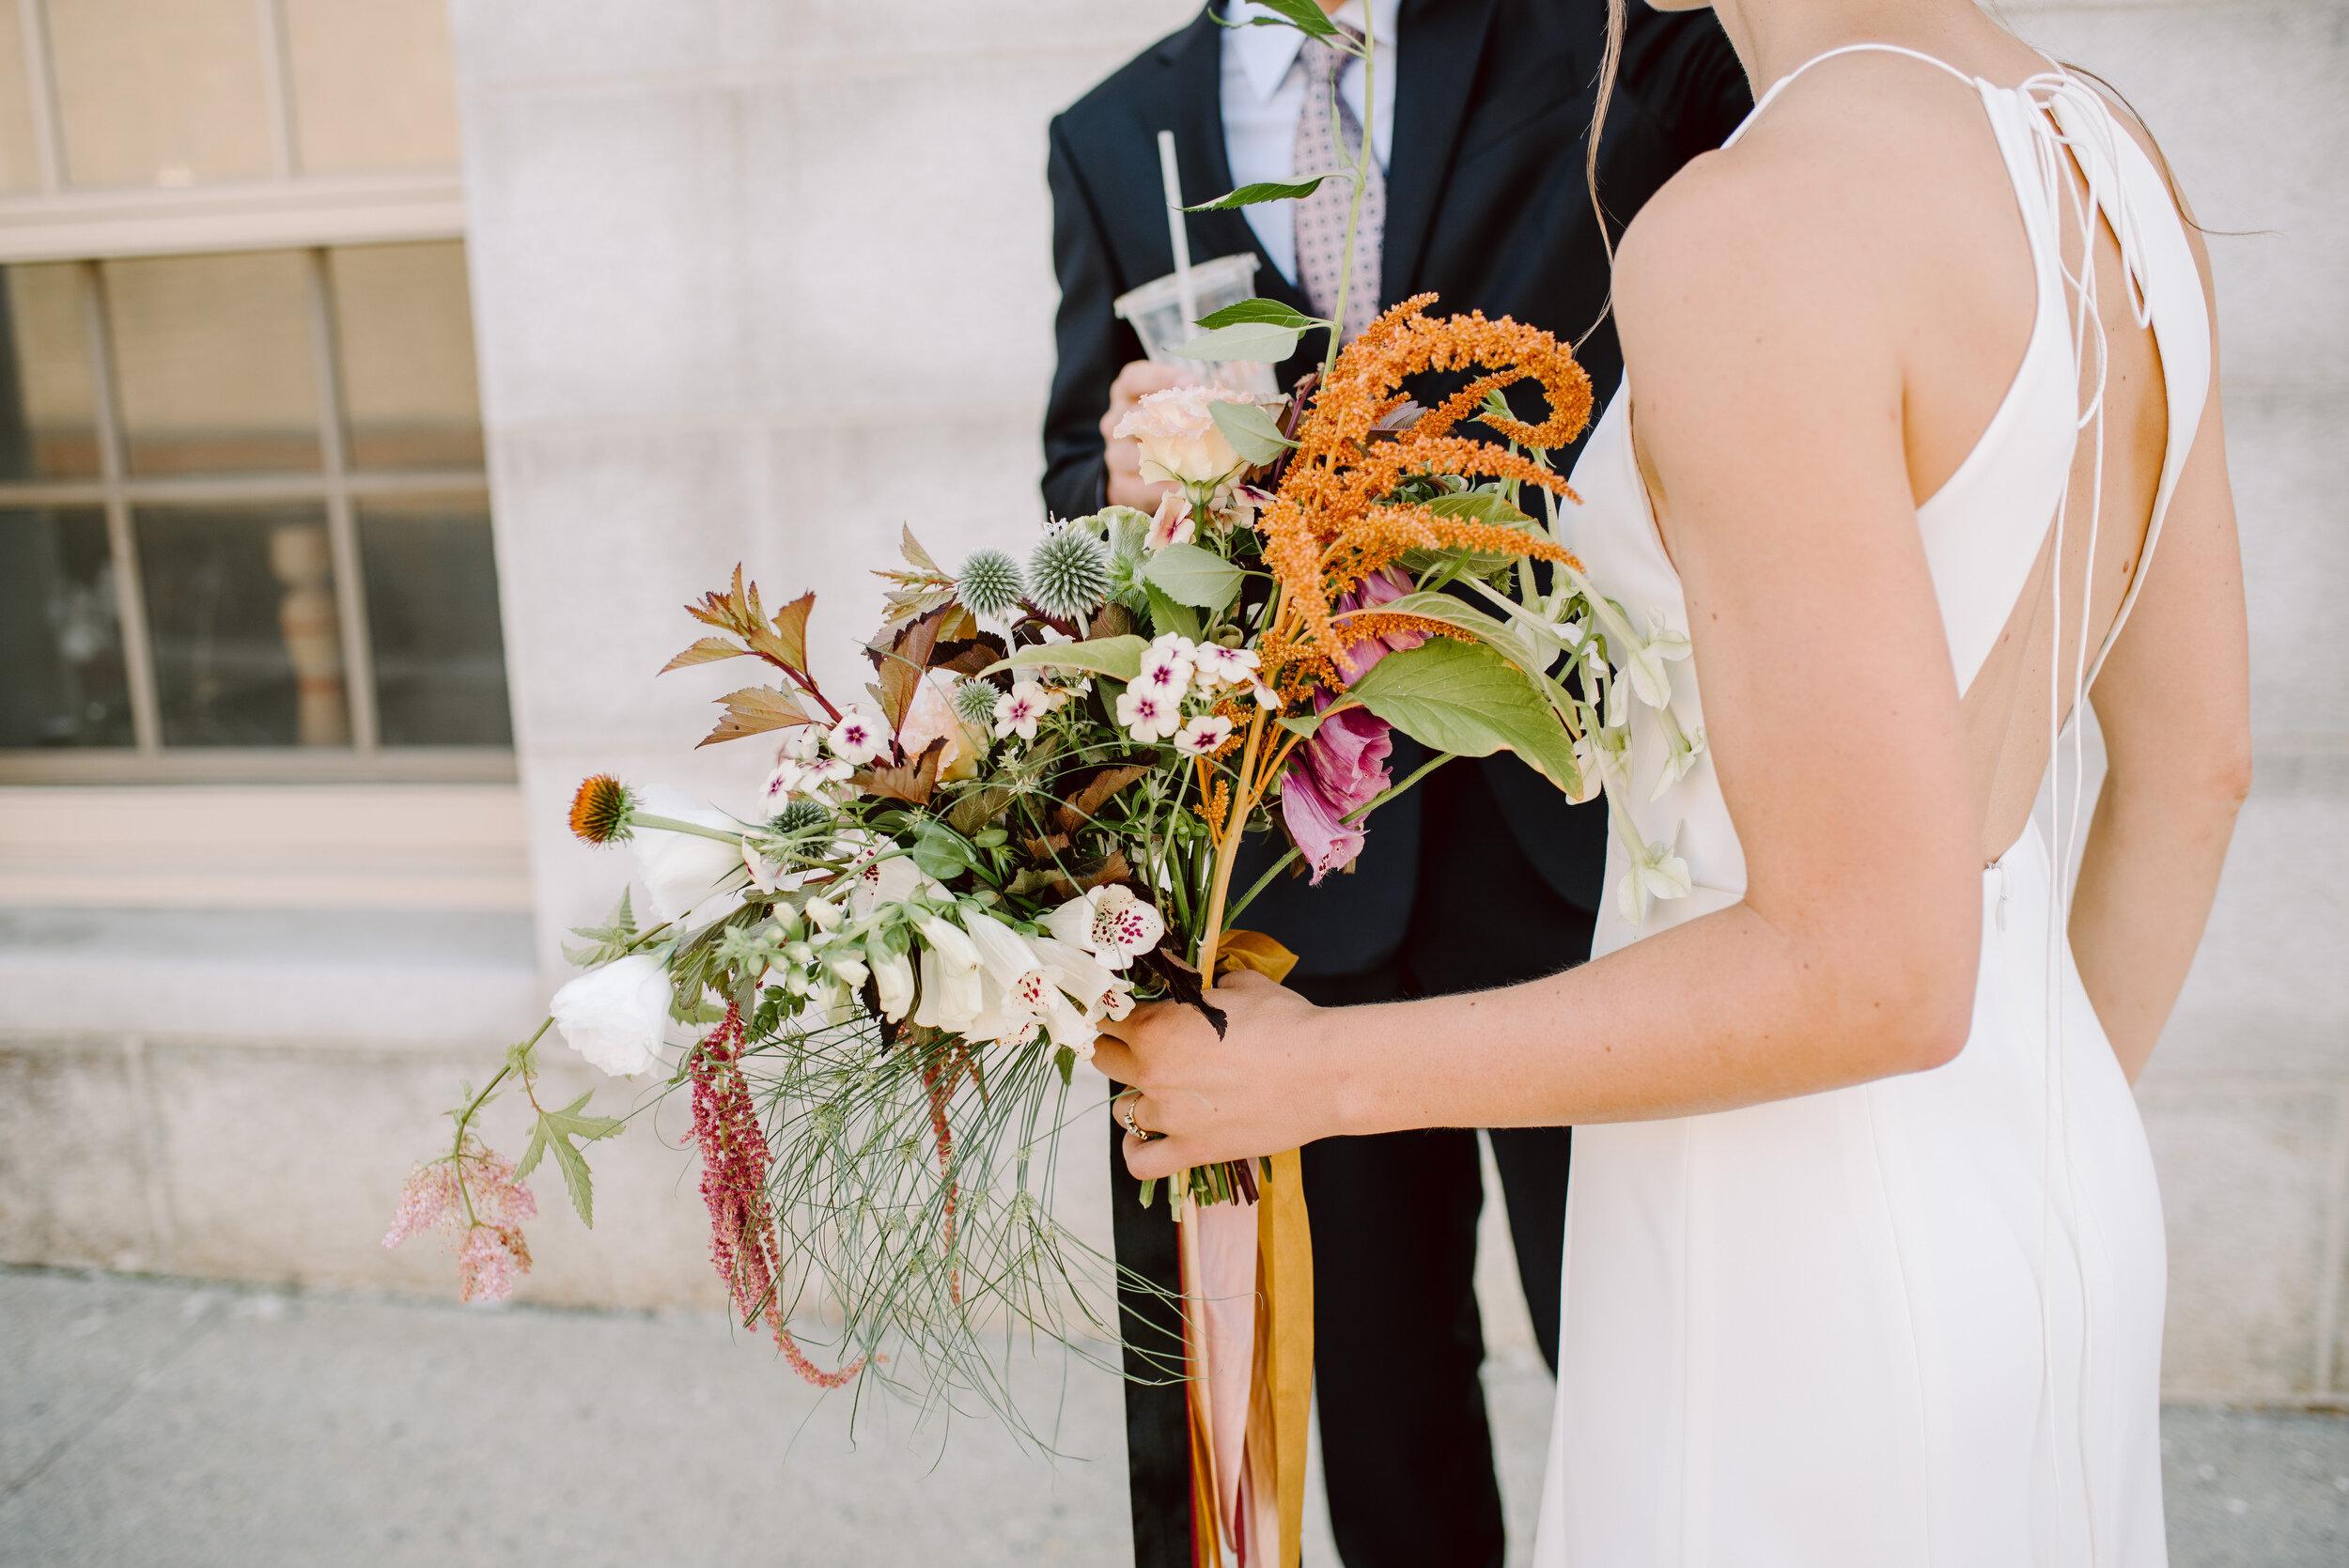 amazing modern wedding flowers by megan hevenor at field floral studio in portland maine